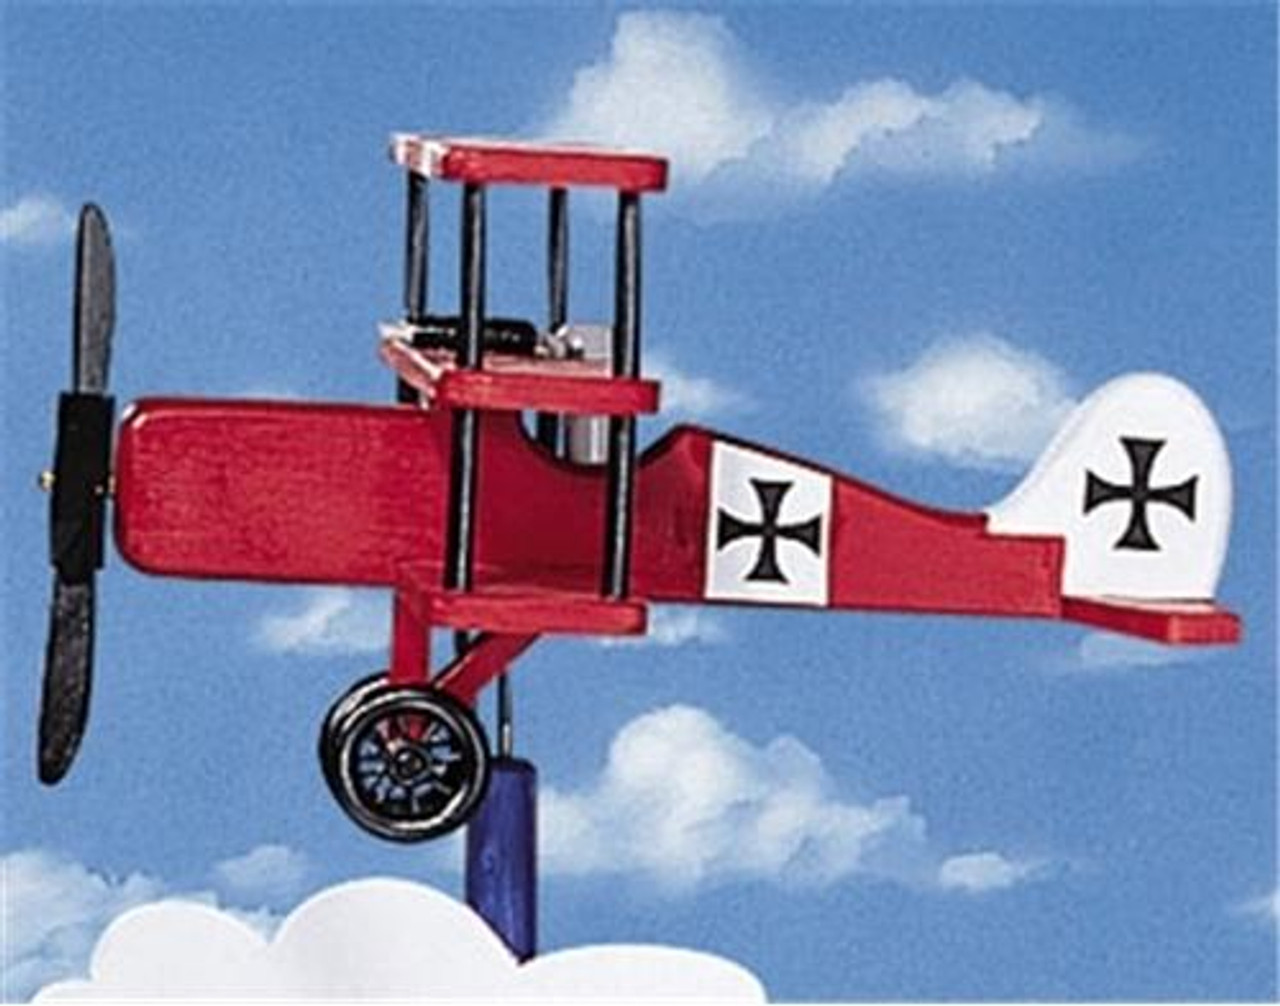 Cherry Tree Toys Tri-Plane Whirligig DIY Kit